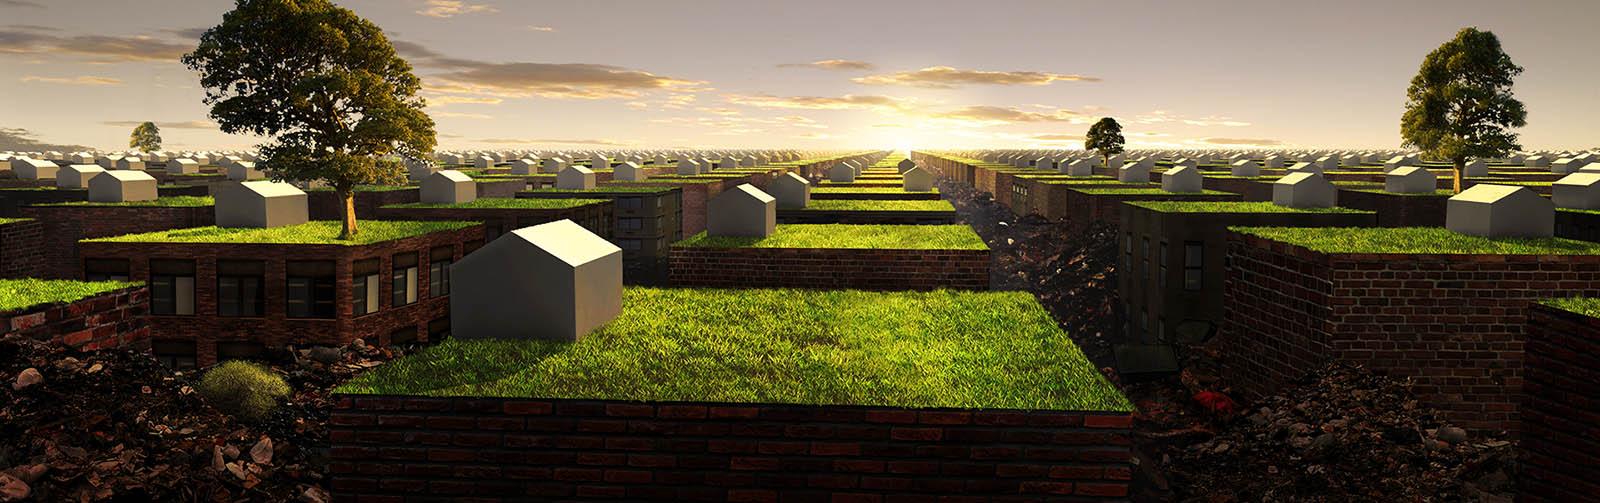 suburban houses extending into horizon